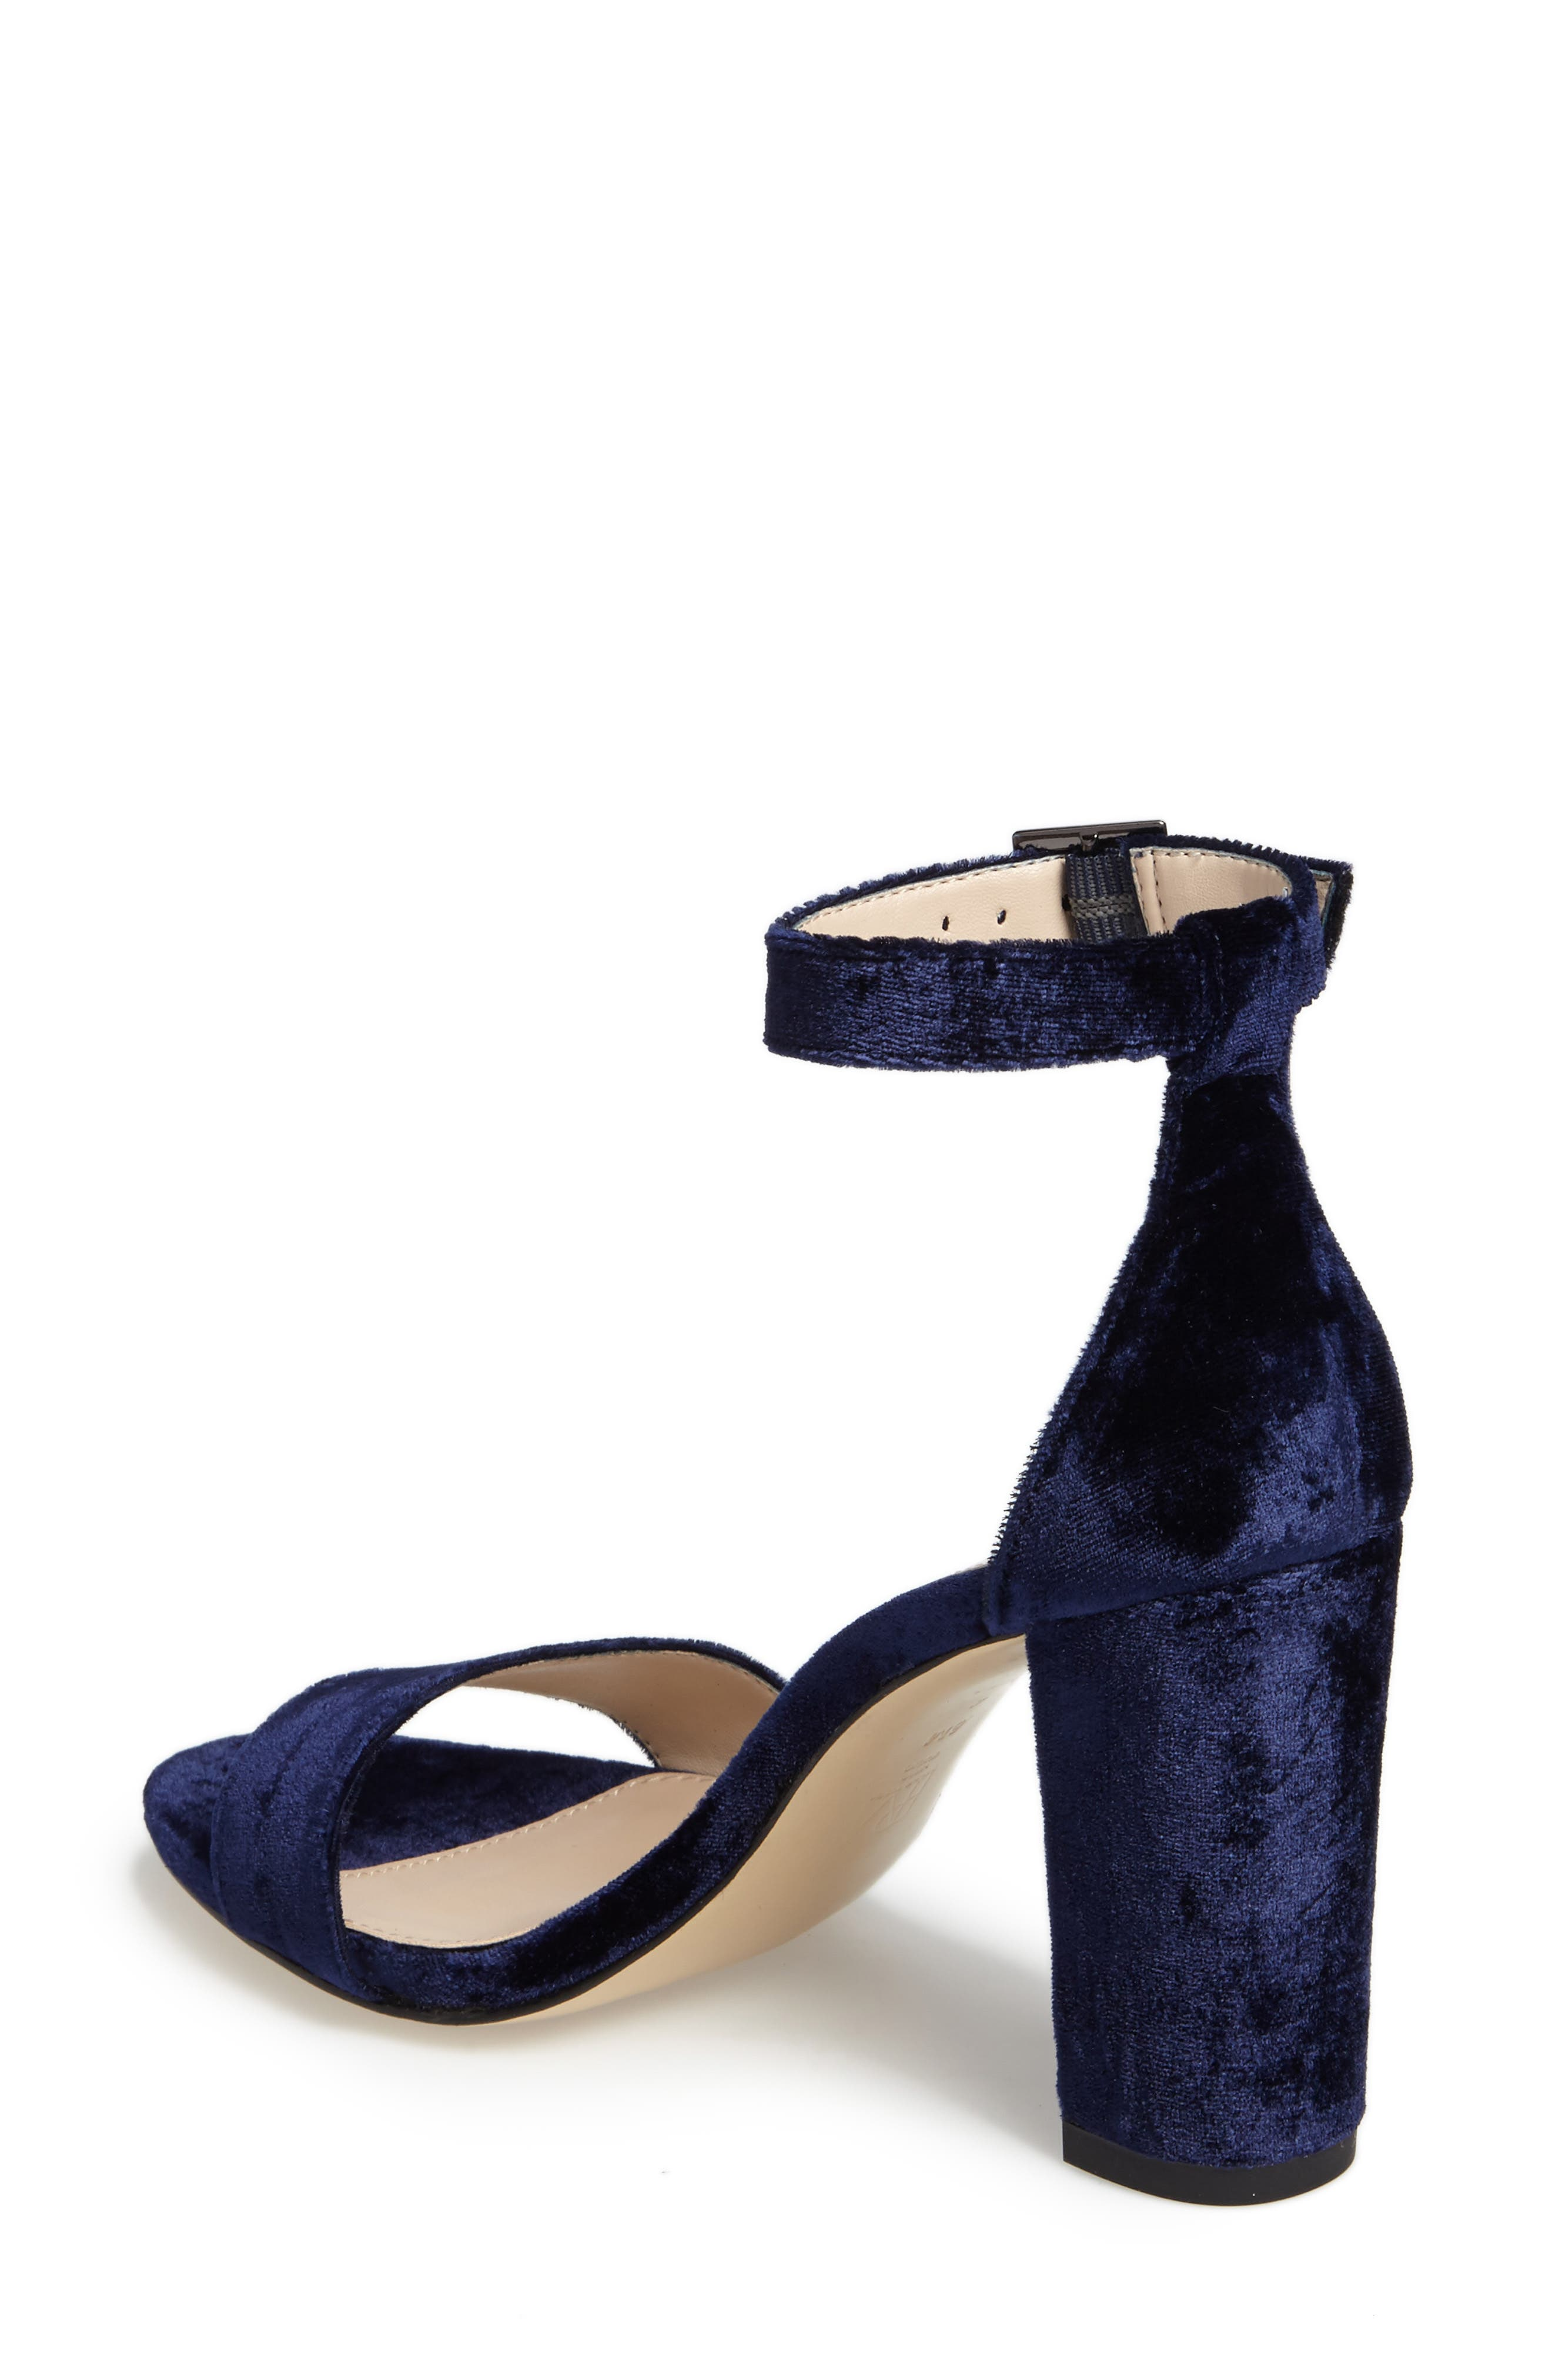 Bonnie Ankle Strap Sandal,                             Alternate thumbnail 2, color,                             Midnight